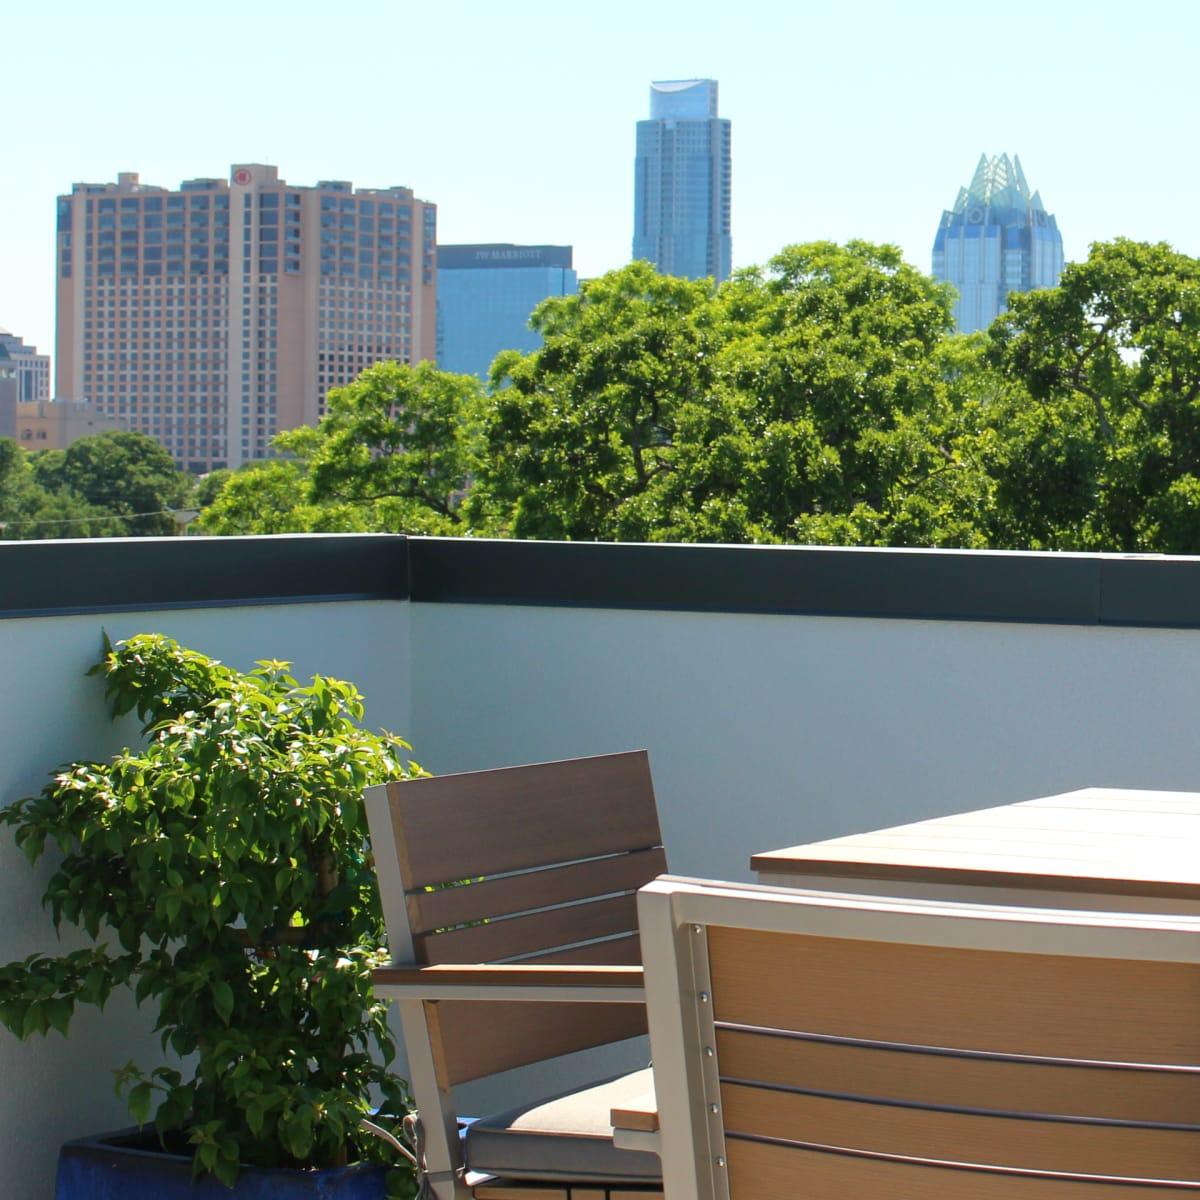 Hotel Eleven 11th Street Austin 2016 rooftop patio skyline view